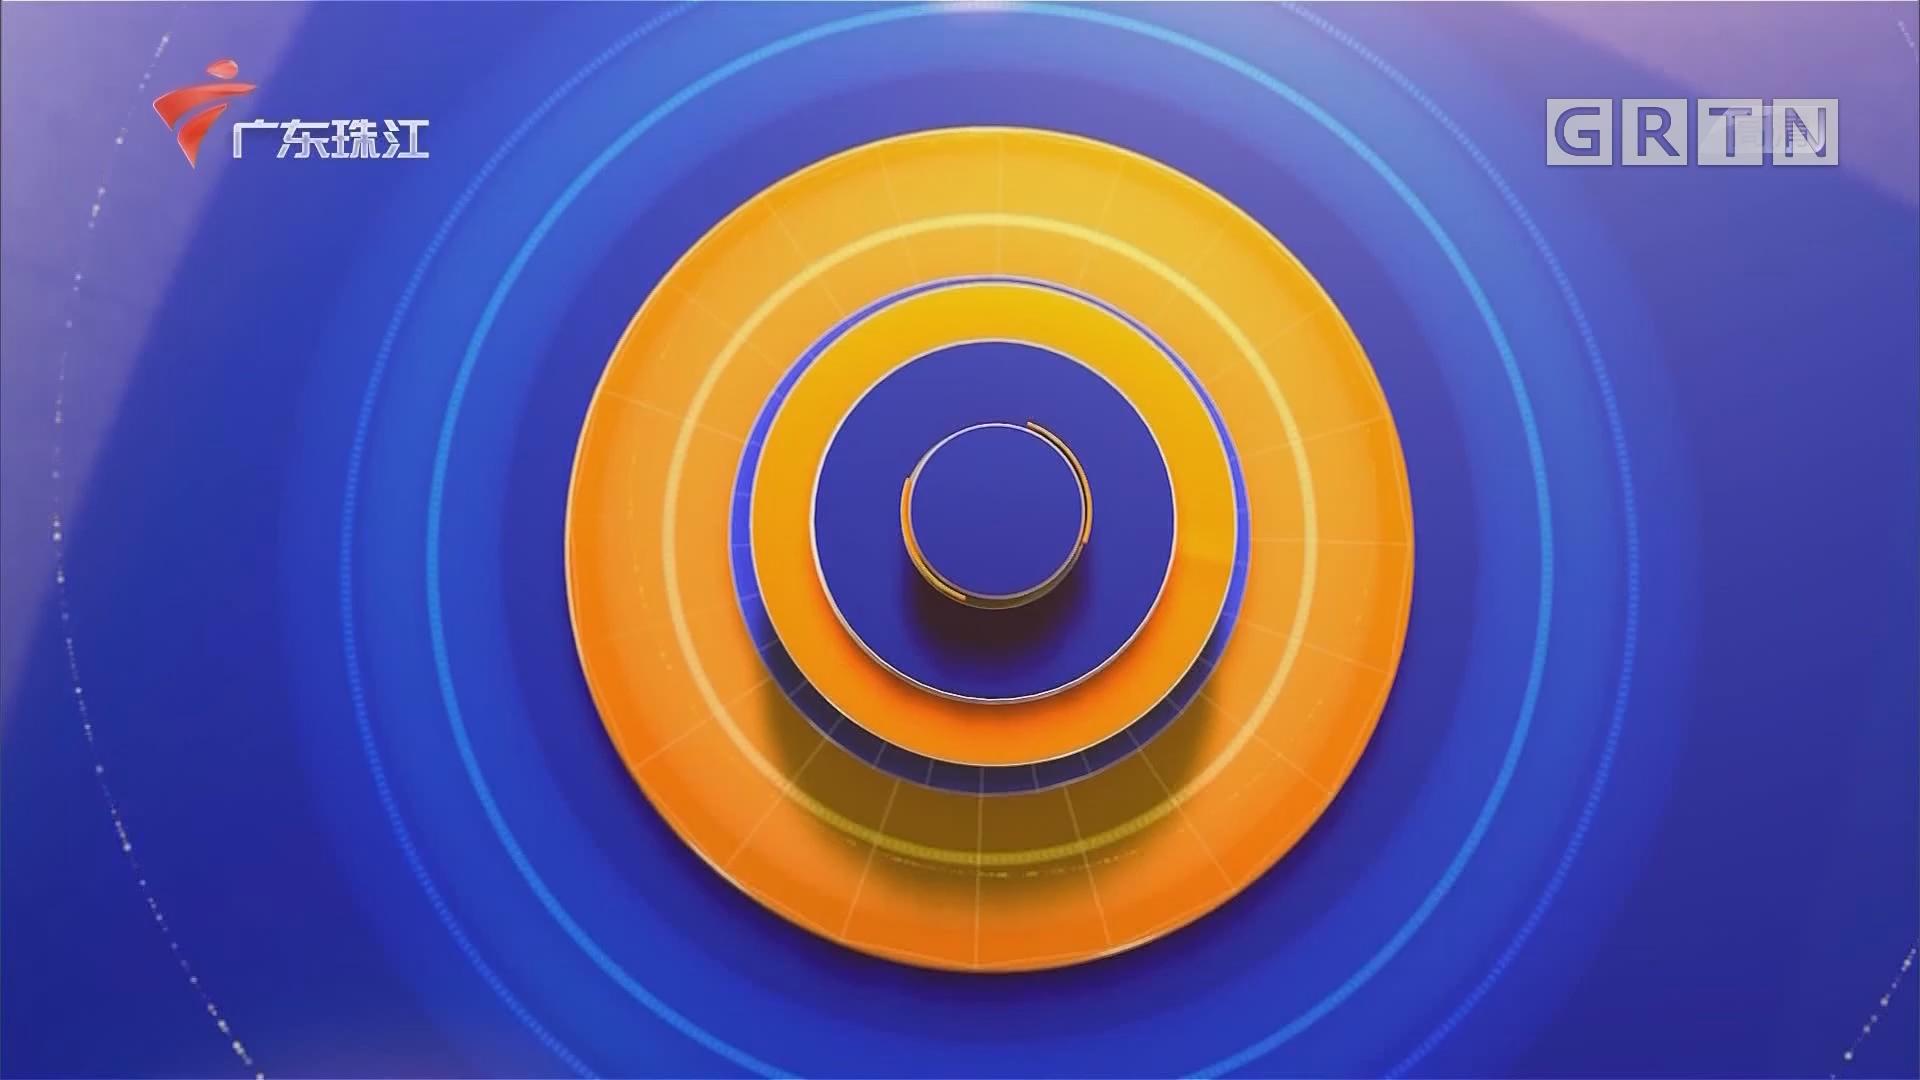 [HD][2020-01-02]今日财经:第二届创新全球论坛聚焦创新 共享机遇